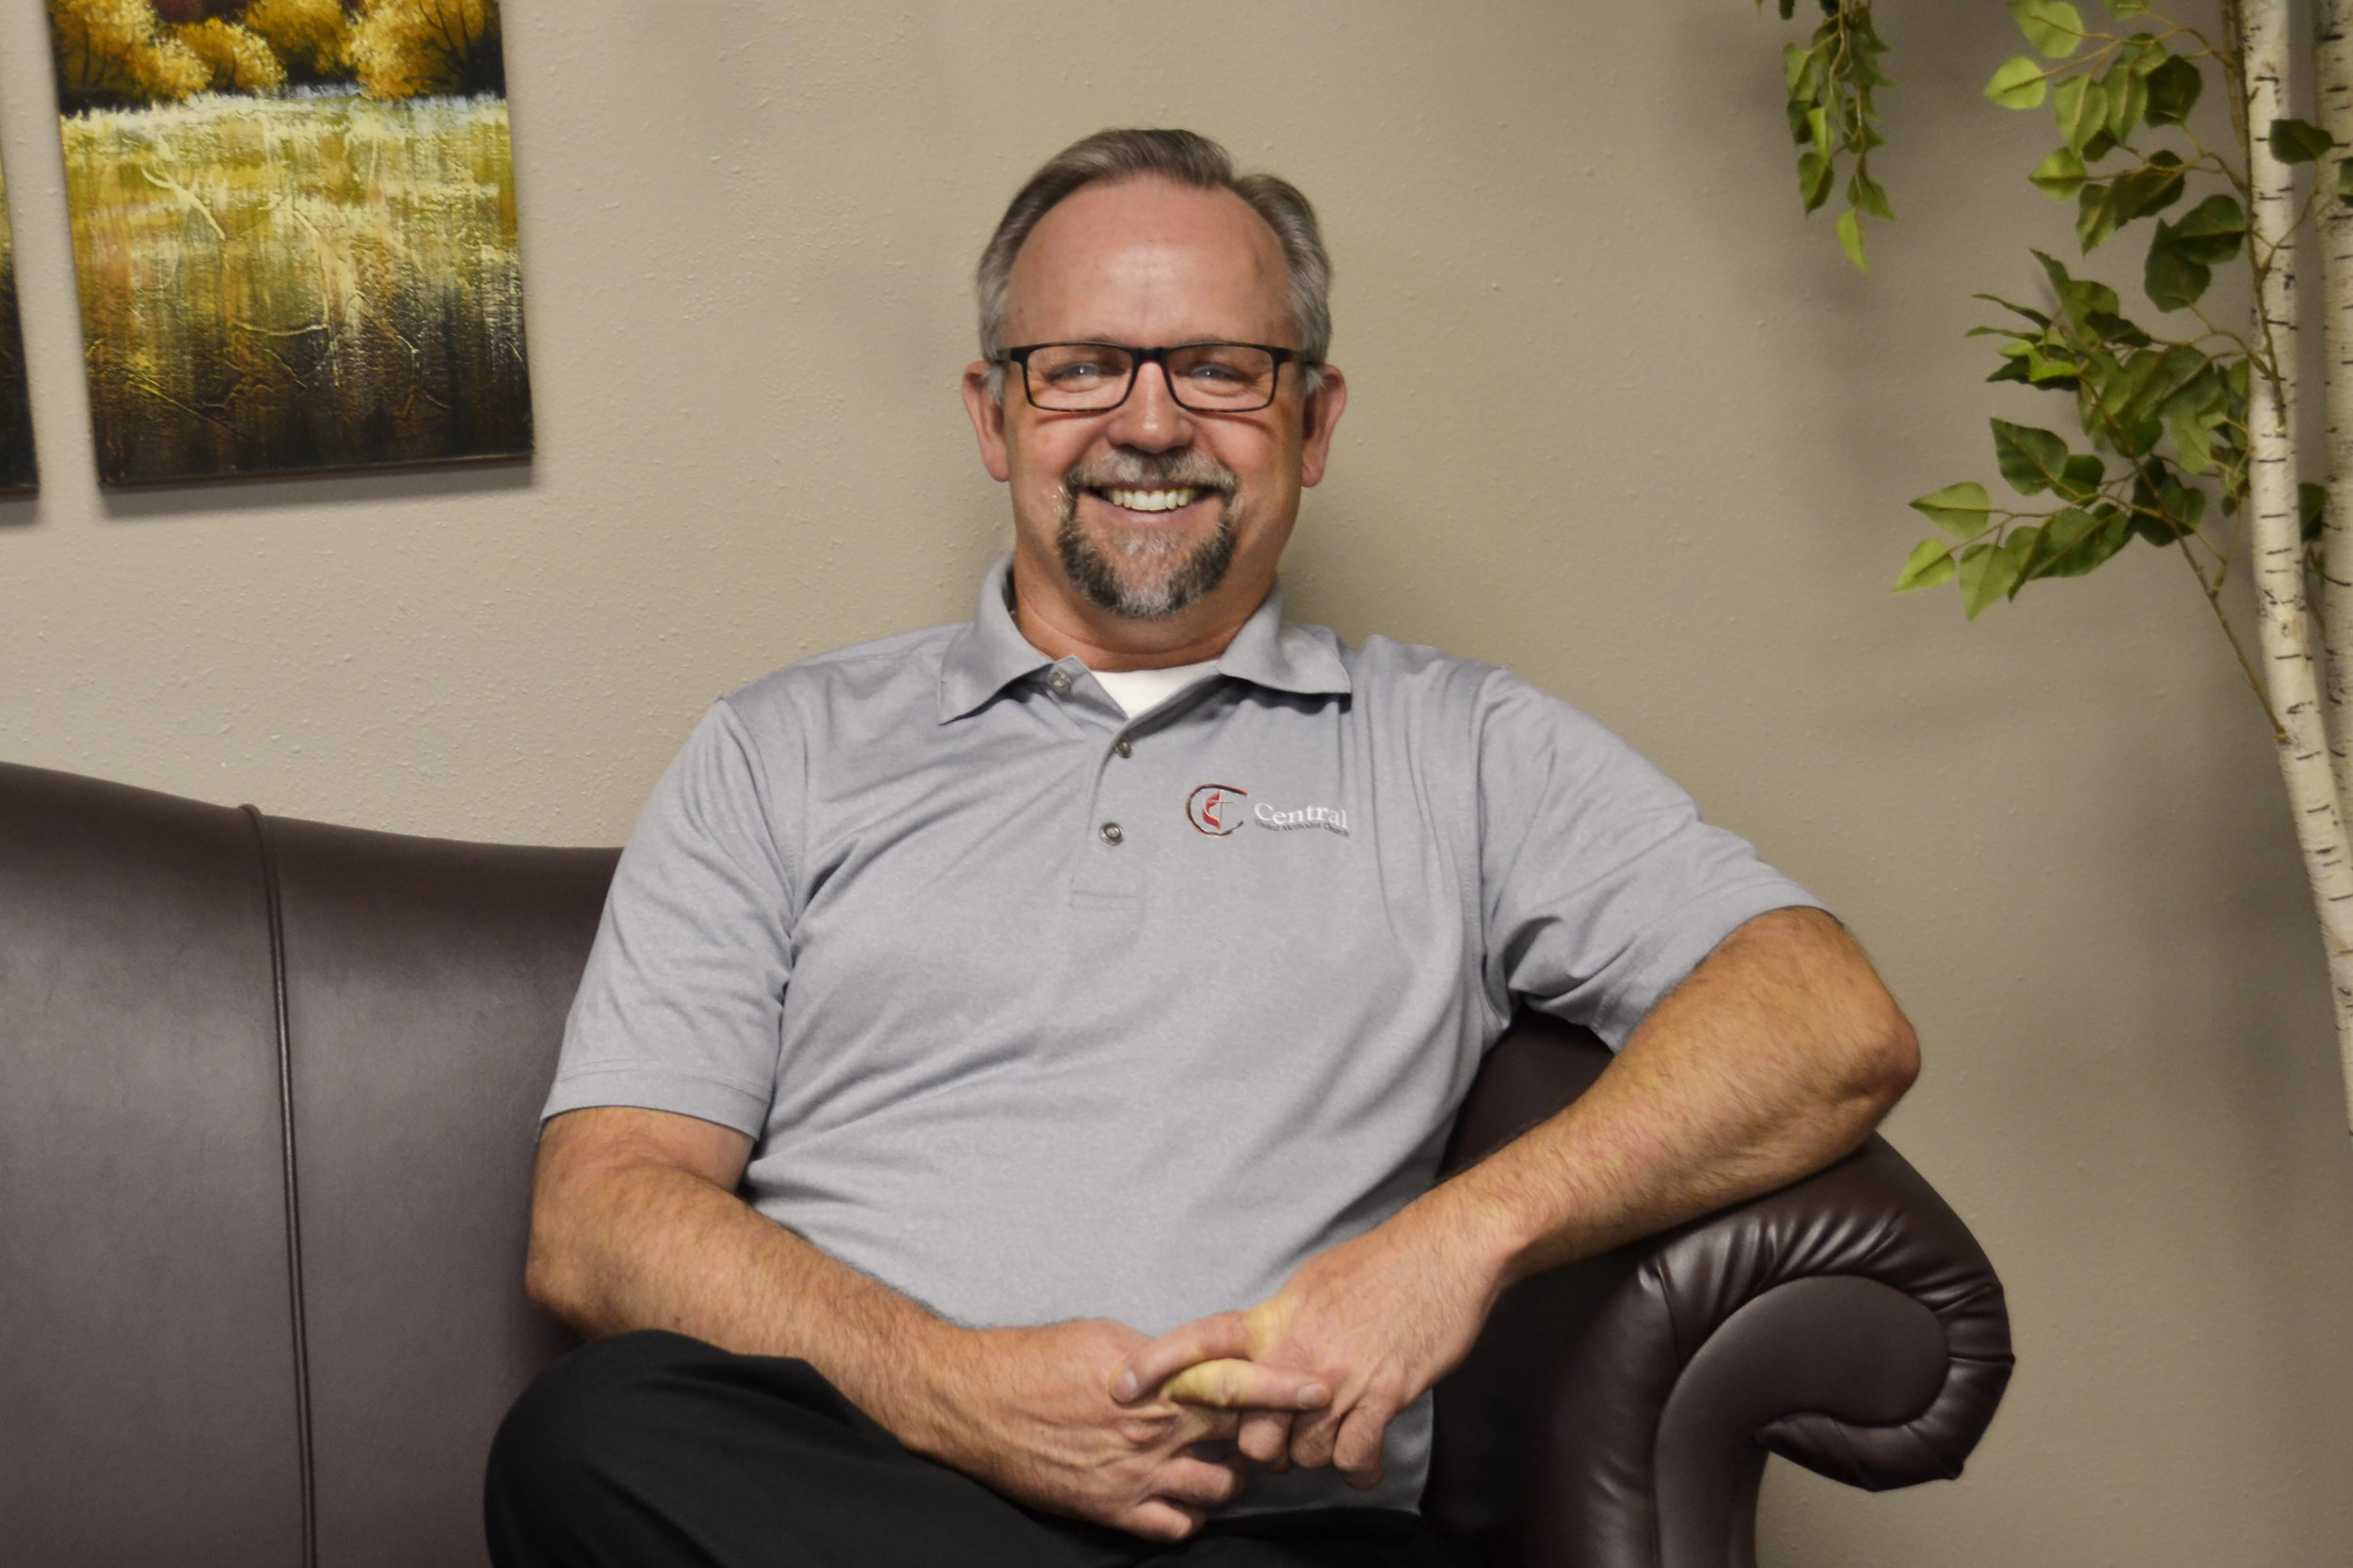 Lead Pastor -Reverend Thom Bowsher - pastorthom@milbankcentral.com(701) 721-3066 - cell(605) 432-5363 - emergencies